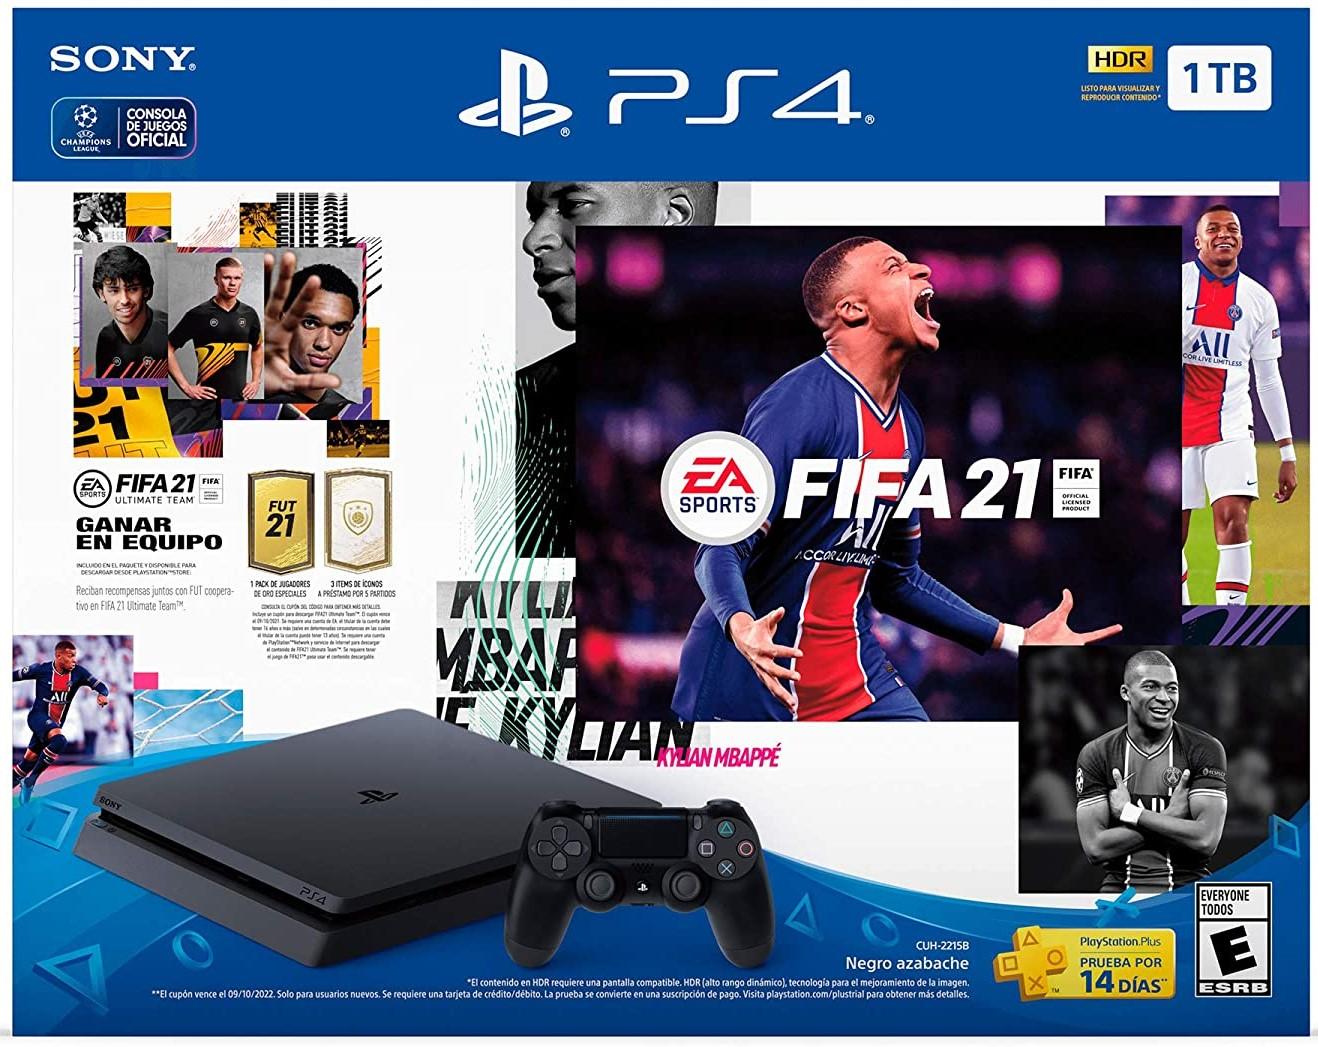 Consola PS4 Slim + FIFA 21